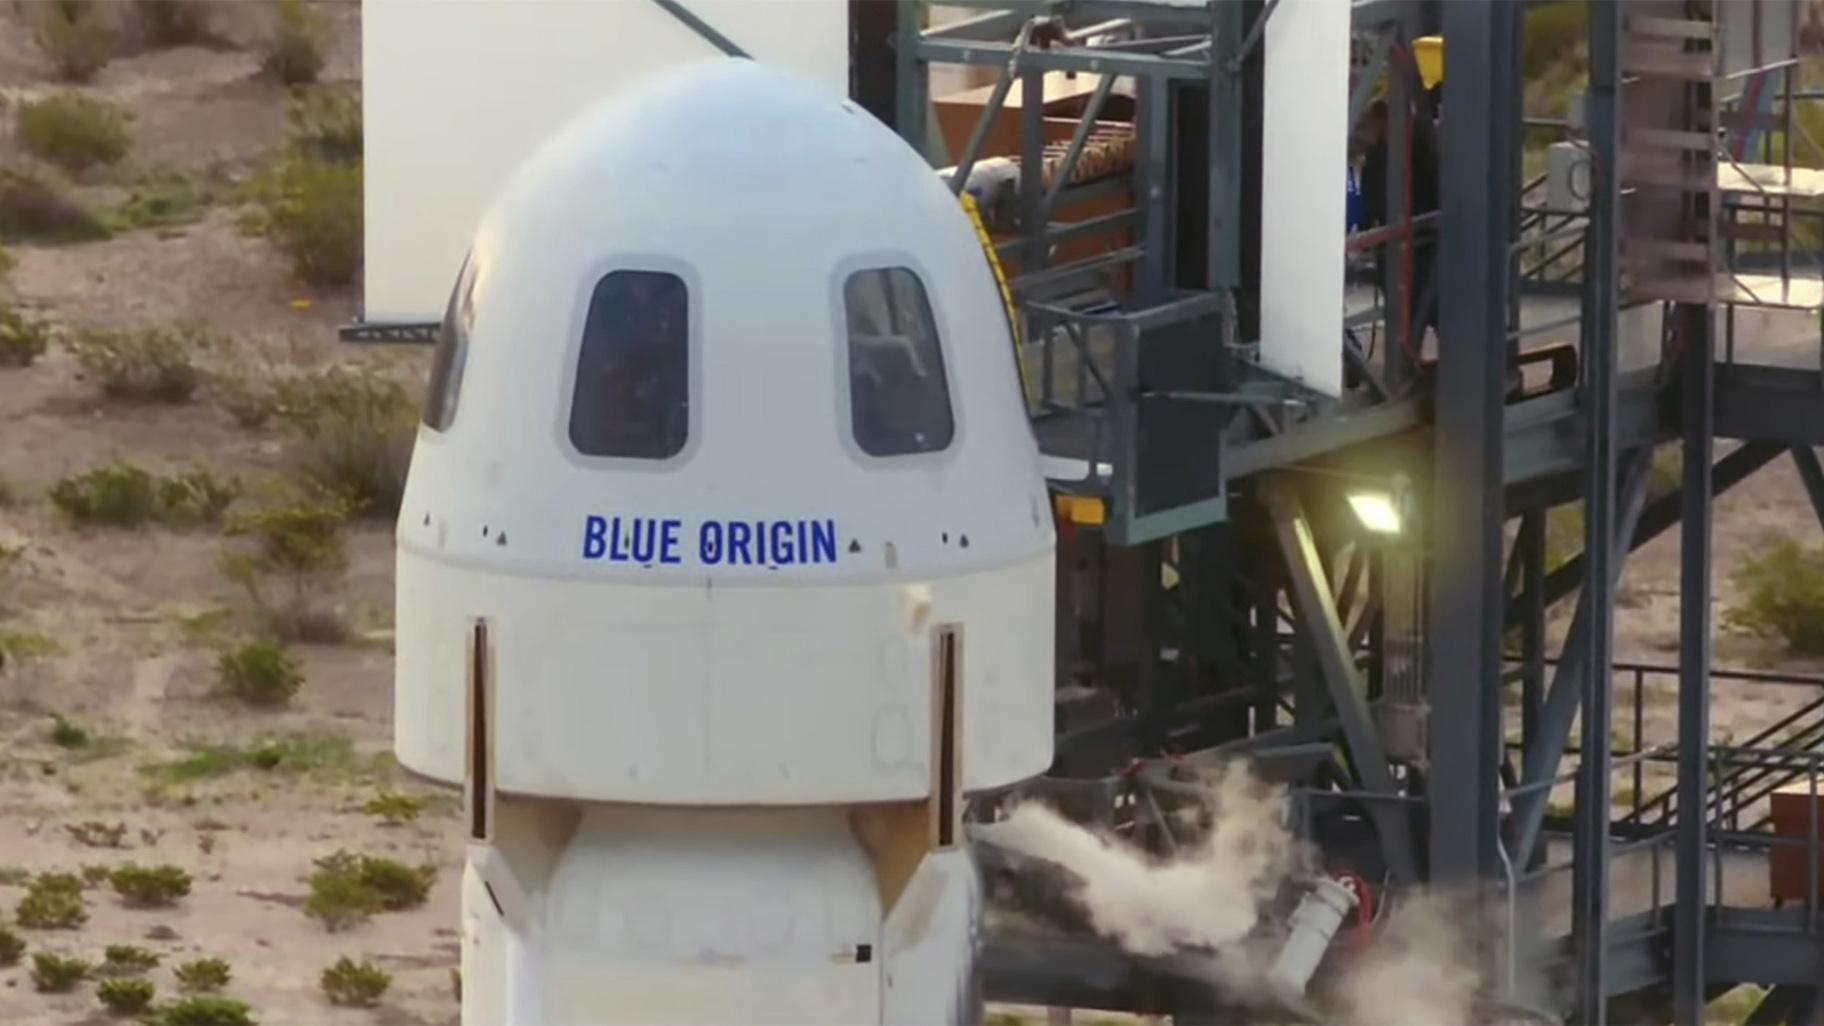 The passengers of the Blue Origin enter the capsule near Van Horn, Texas, Tuesday, July 20, 2021. (Blue Origin via AP)  - Blue Origin Bezos 21201454612944 - Jeff Bezos Blasts Into Space on Own Rocket: 'Best Day Ever!'   Chicago News